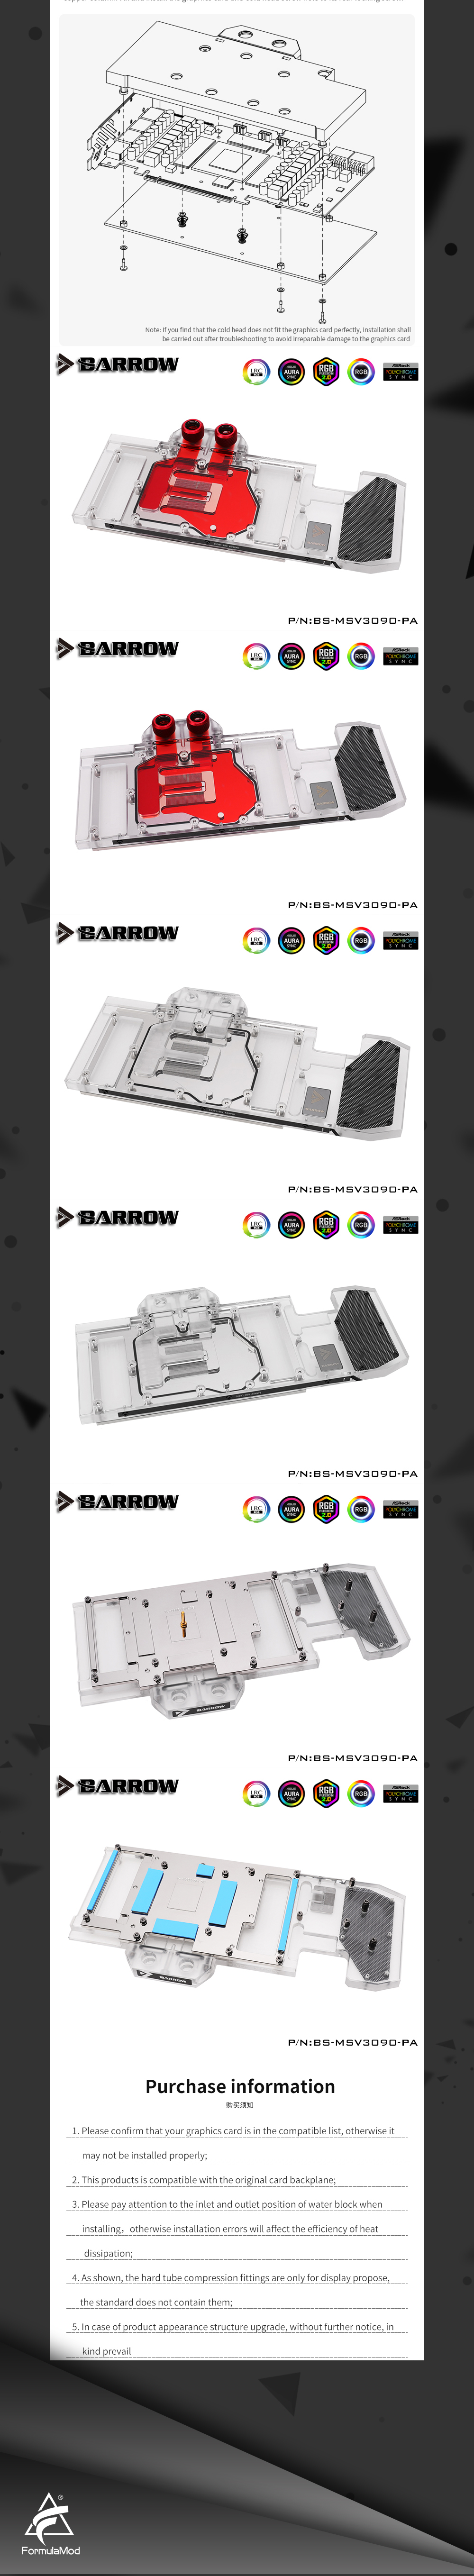 Barrow 3090 3080 GPU Water Block for MSI RTX3090 3080 VENTUS 3X OC, Full Cover ARGB GPU Cooler, BS-MSV3090-PA